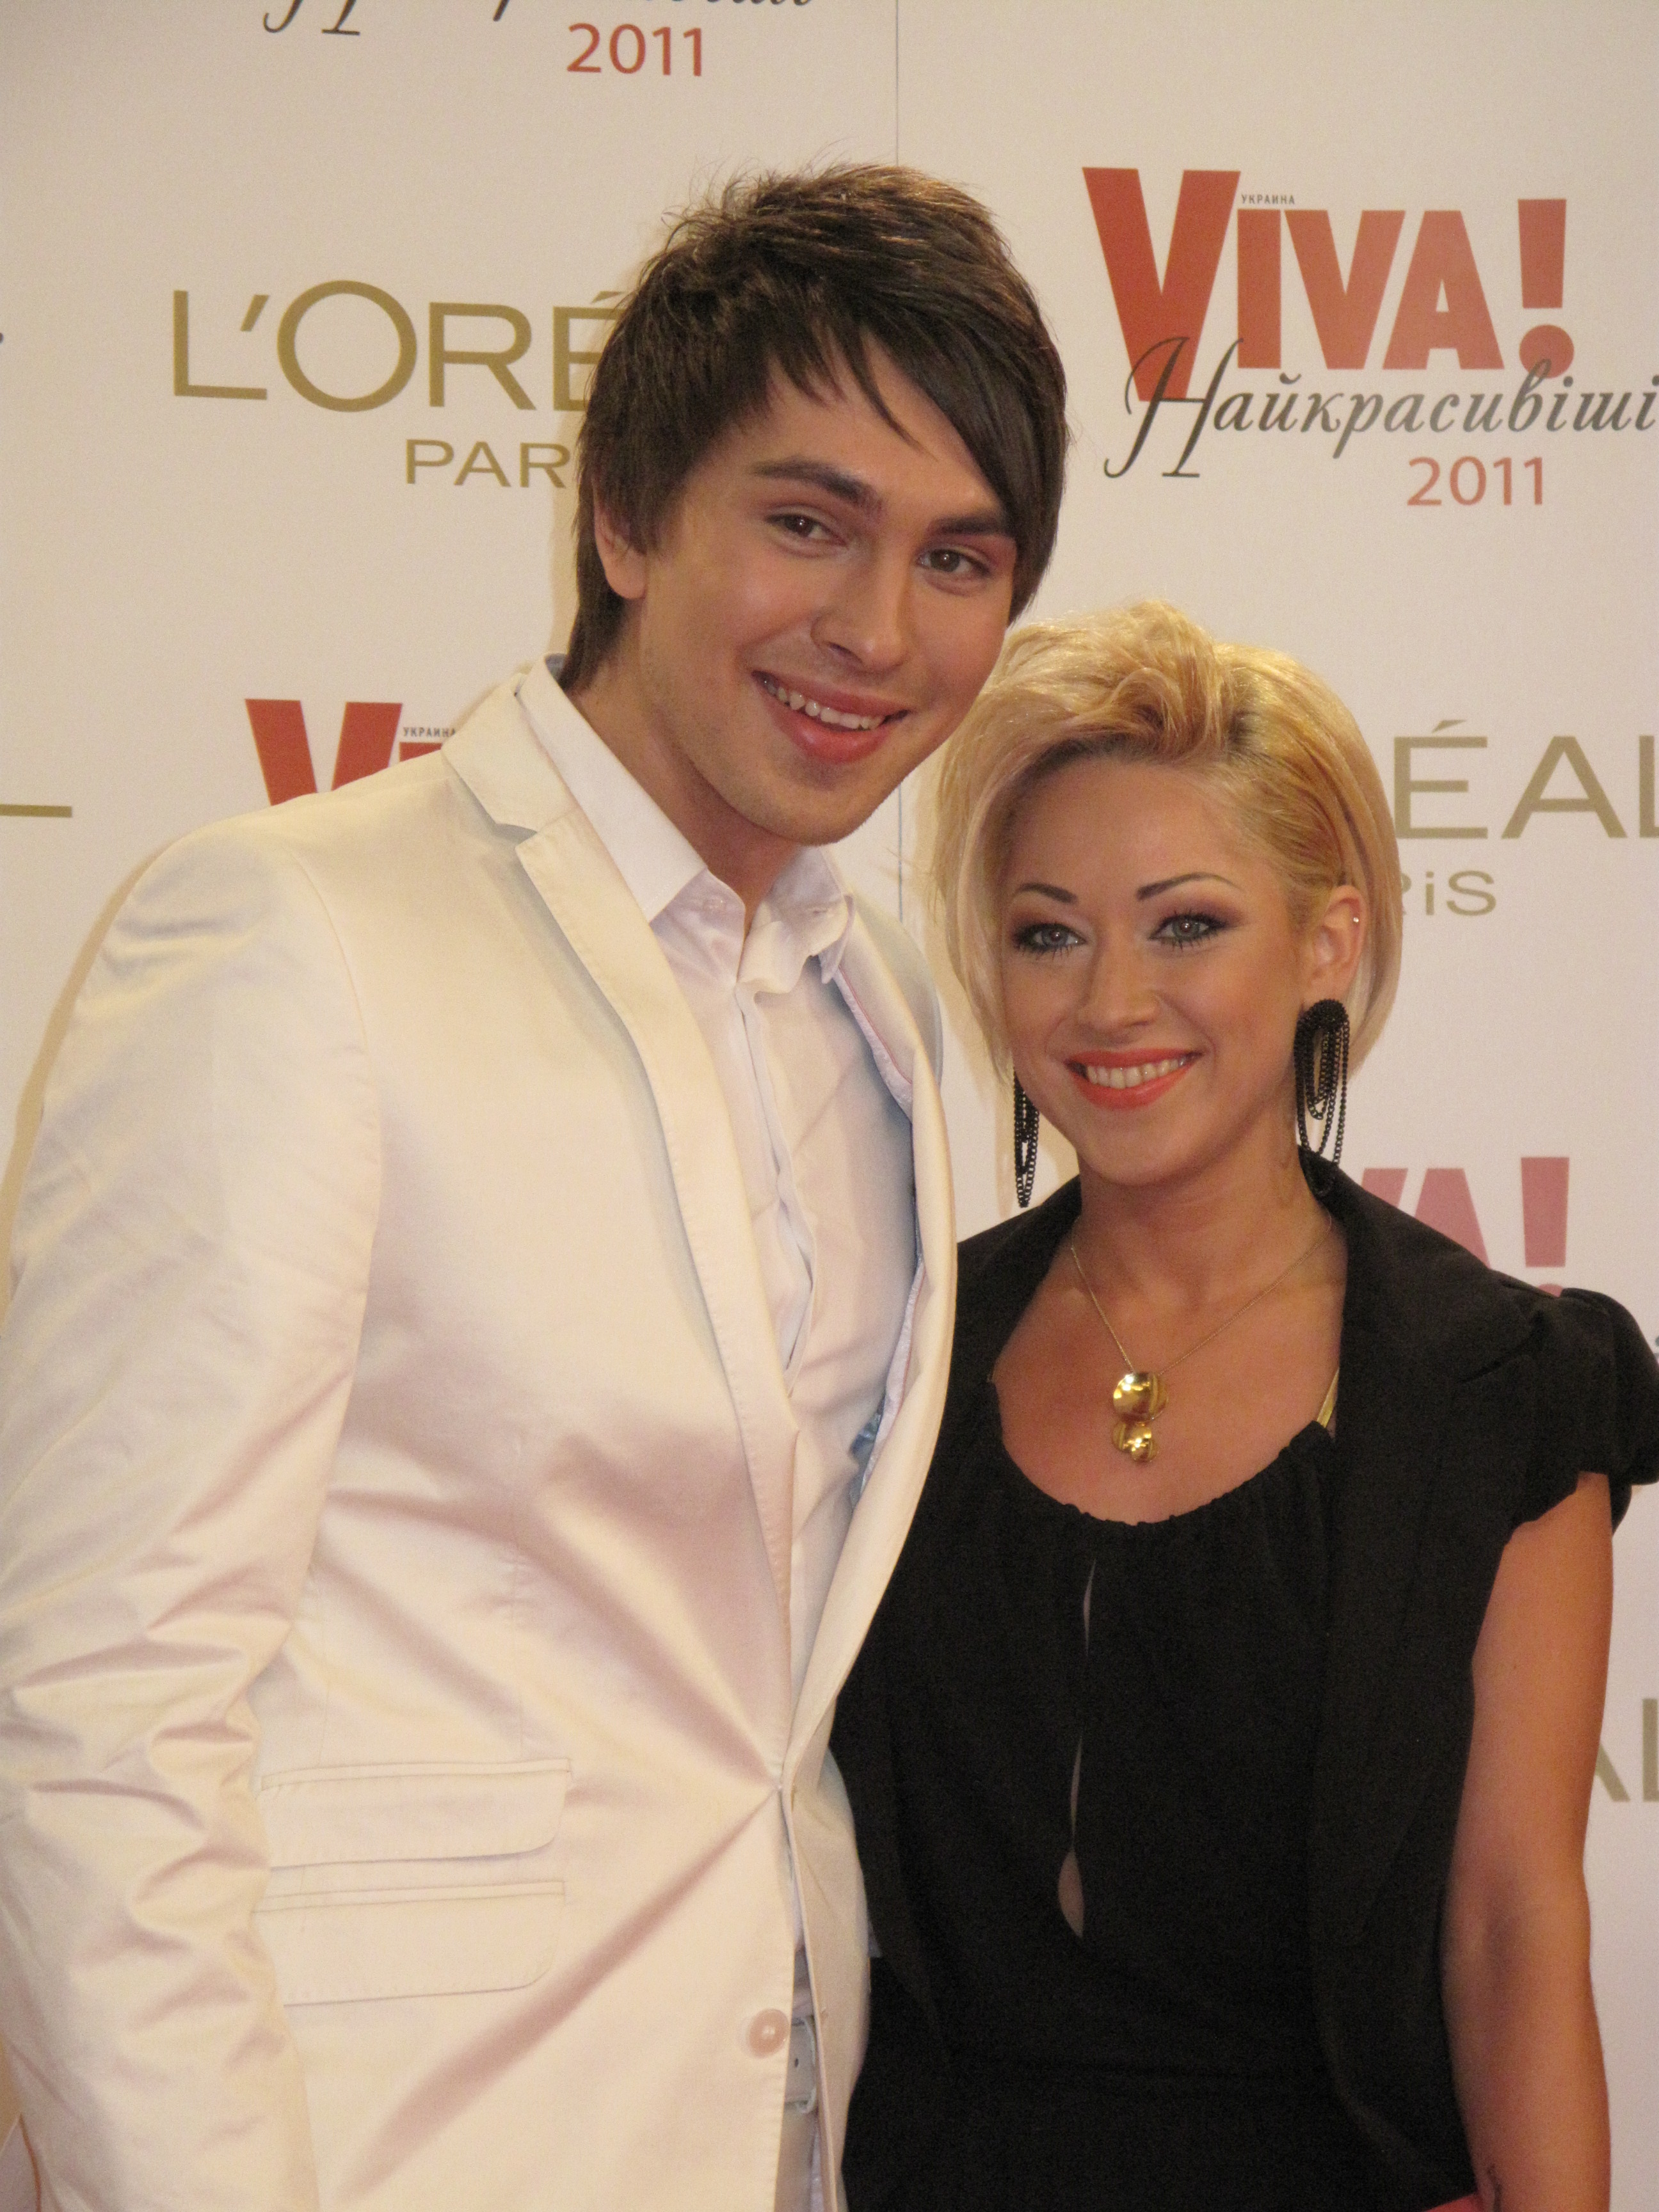 Viva! Найкрасивіші 2011. Фото: Олена Балакіна/The Epoch Times Україна